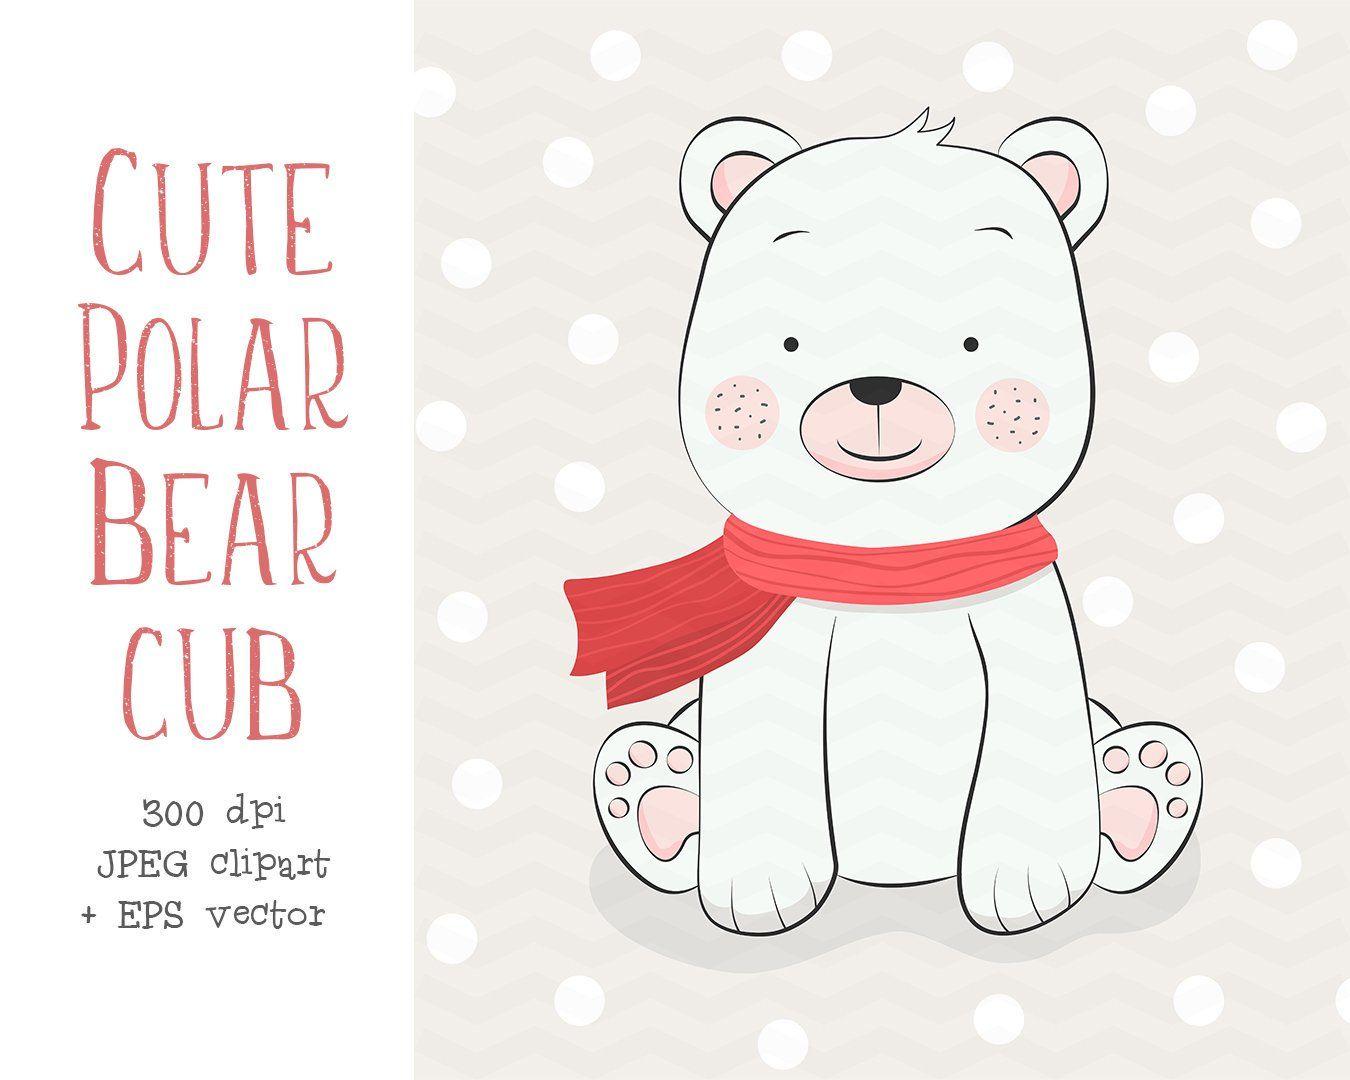 Cute Polar Bear Cub Clipart Polar Bear Illustration Hand Drawn